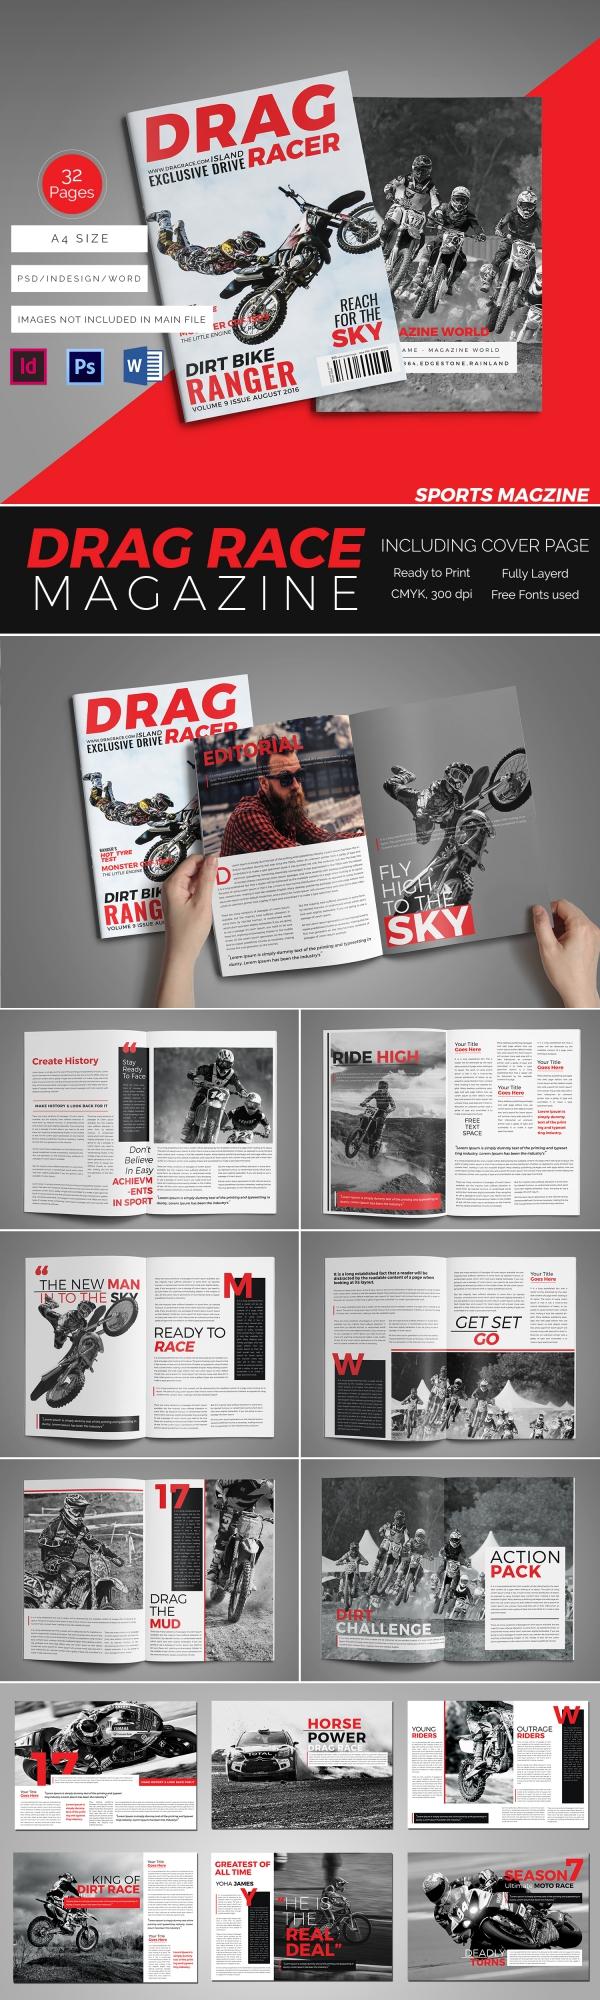 Sports Magazine Mockup